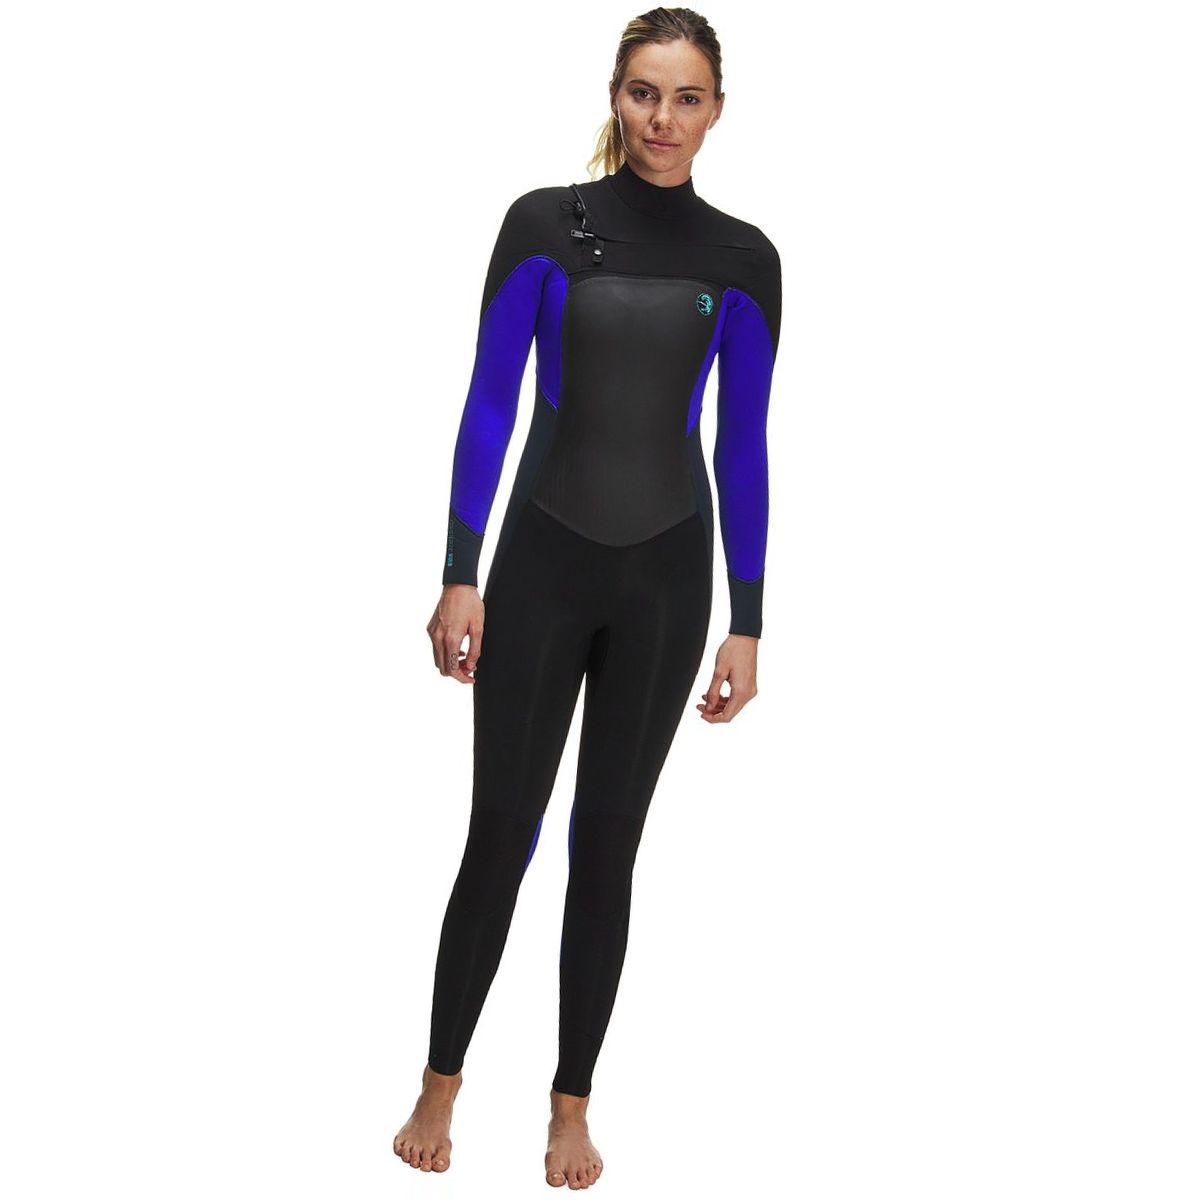 O'Neill O'riginal Fuze 3/2 Taped Wetsuit - Women's